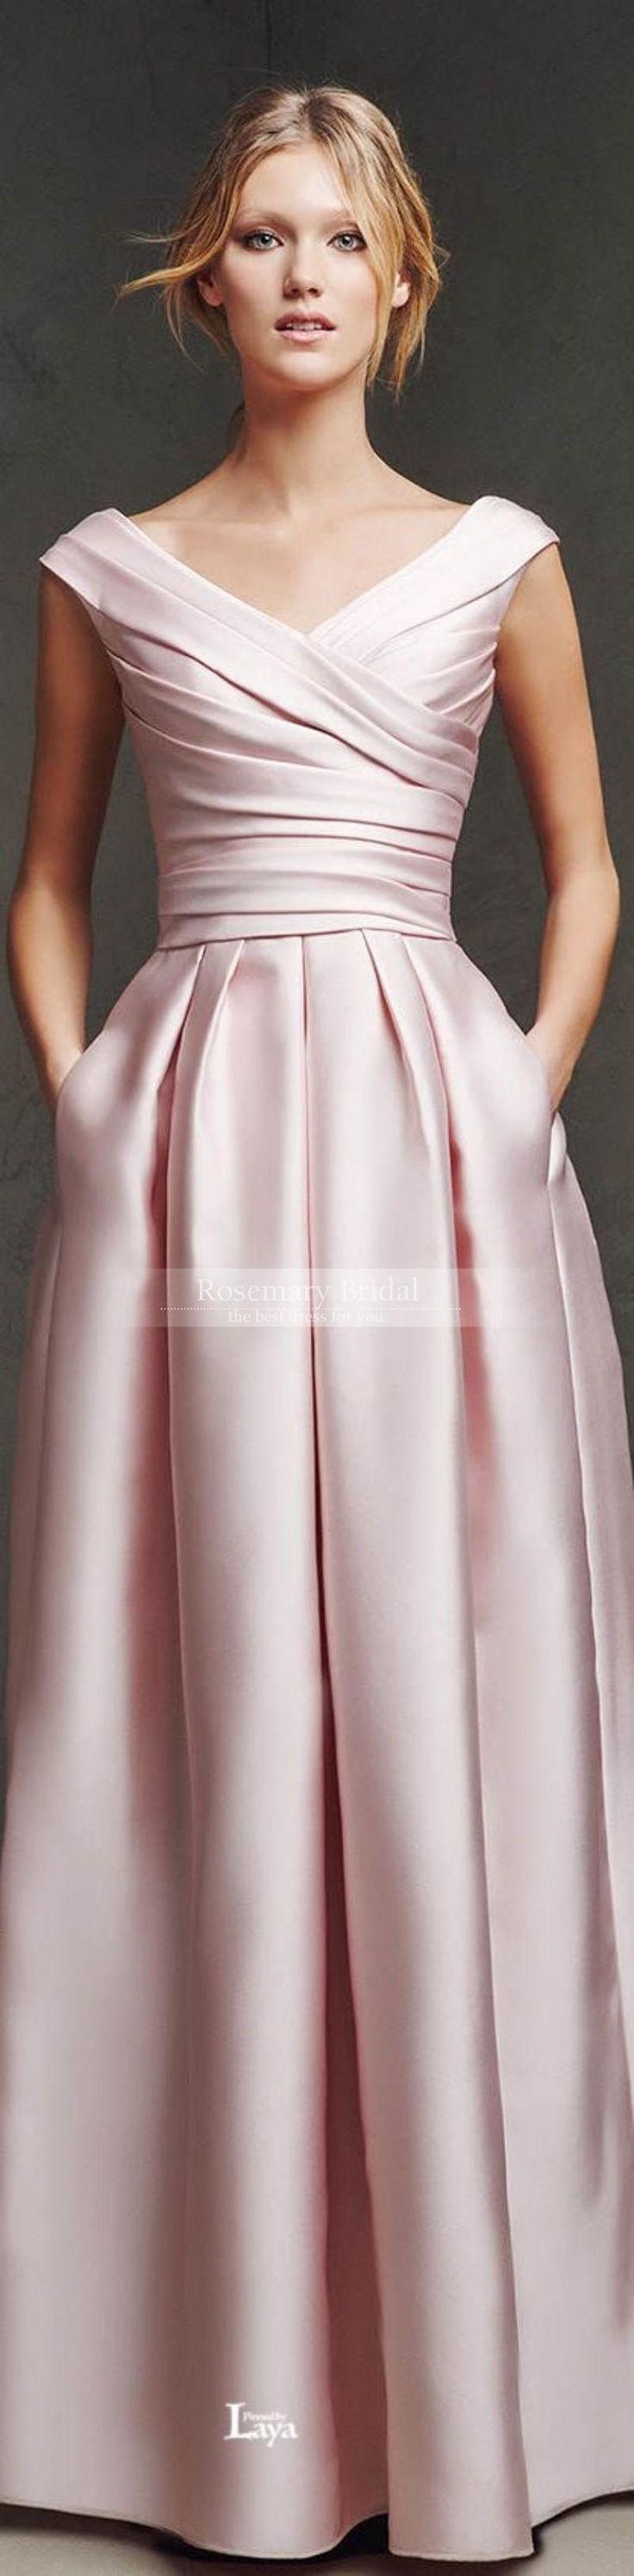 The 25+ best Pastel bridesmaid dresses ideas on Pinterest ...